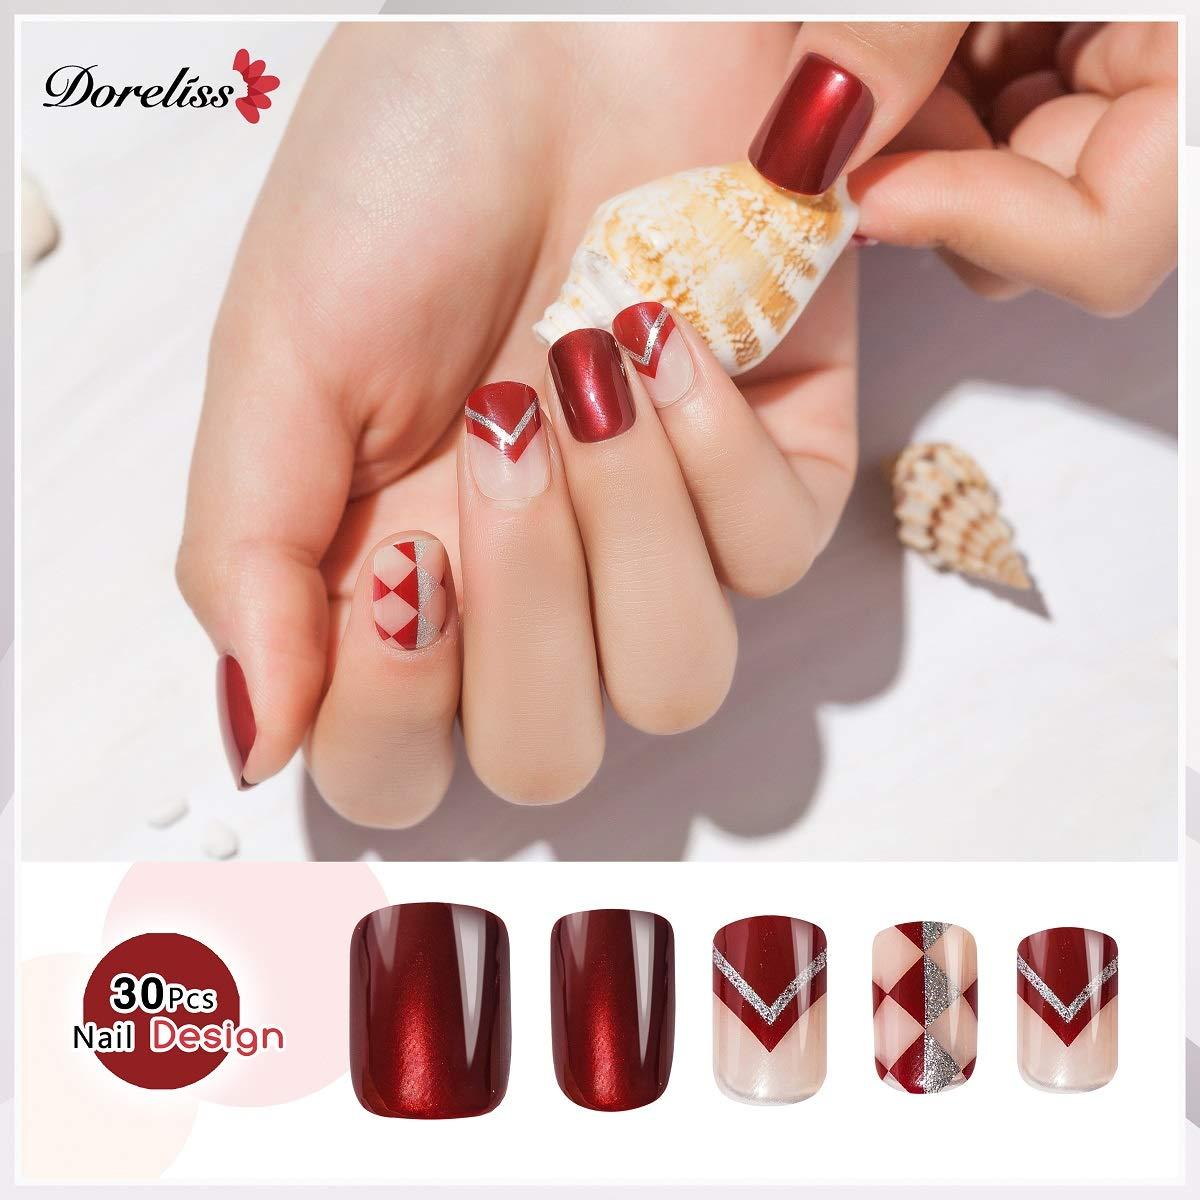 Doreliss uñas postizas 30 Pcs Consejos corto uñas falsas de Pegamento adhesivo de doble cara Glitter Rojo